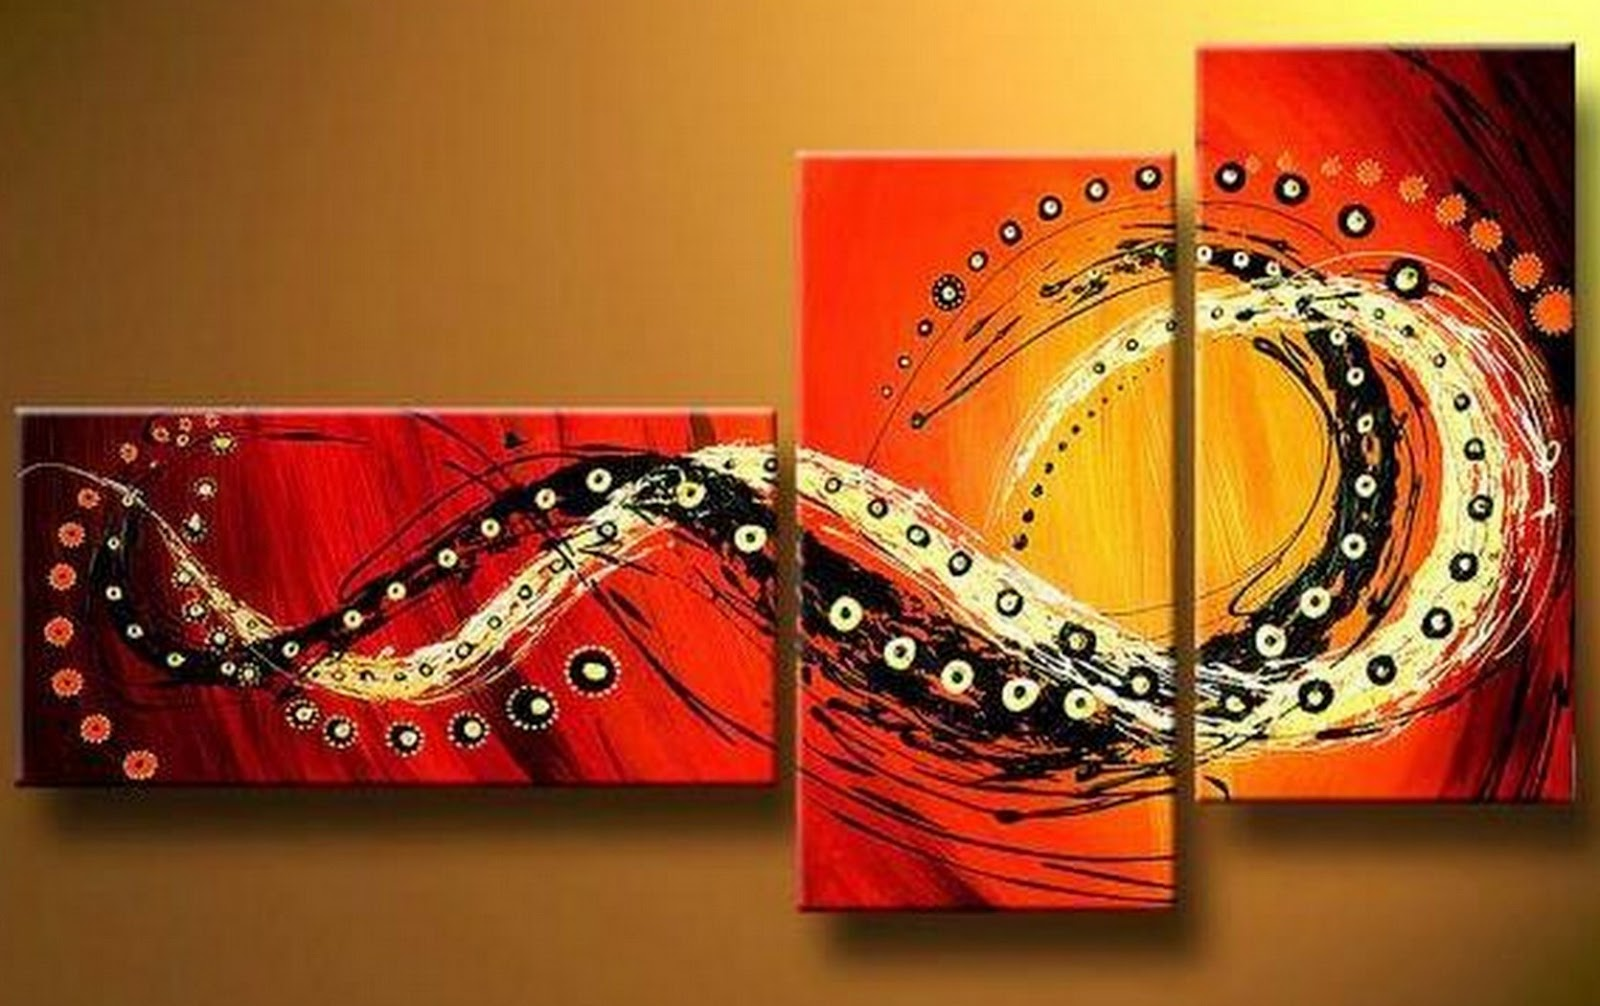 Pintura moderna y fotograf a art stica pinturas al leo - Cuadros faciles de copiar ...